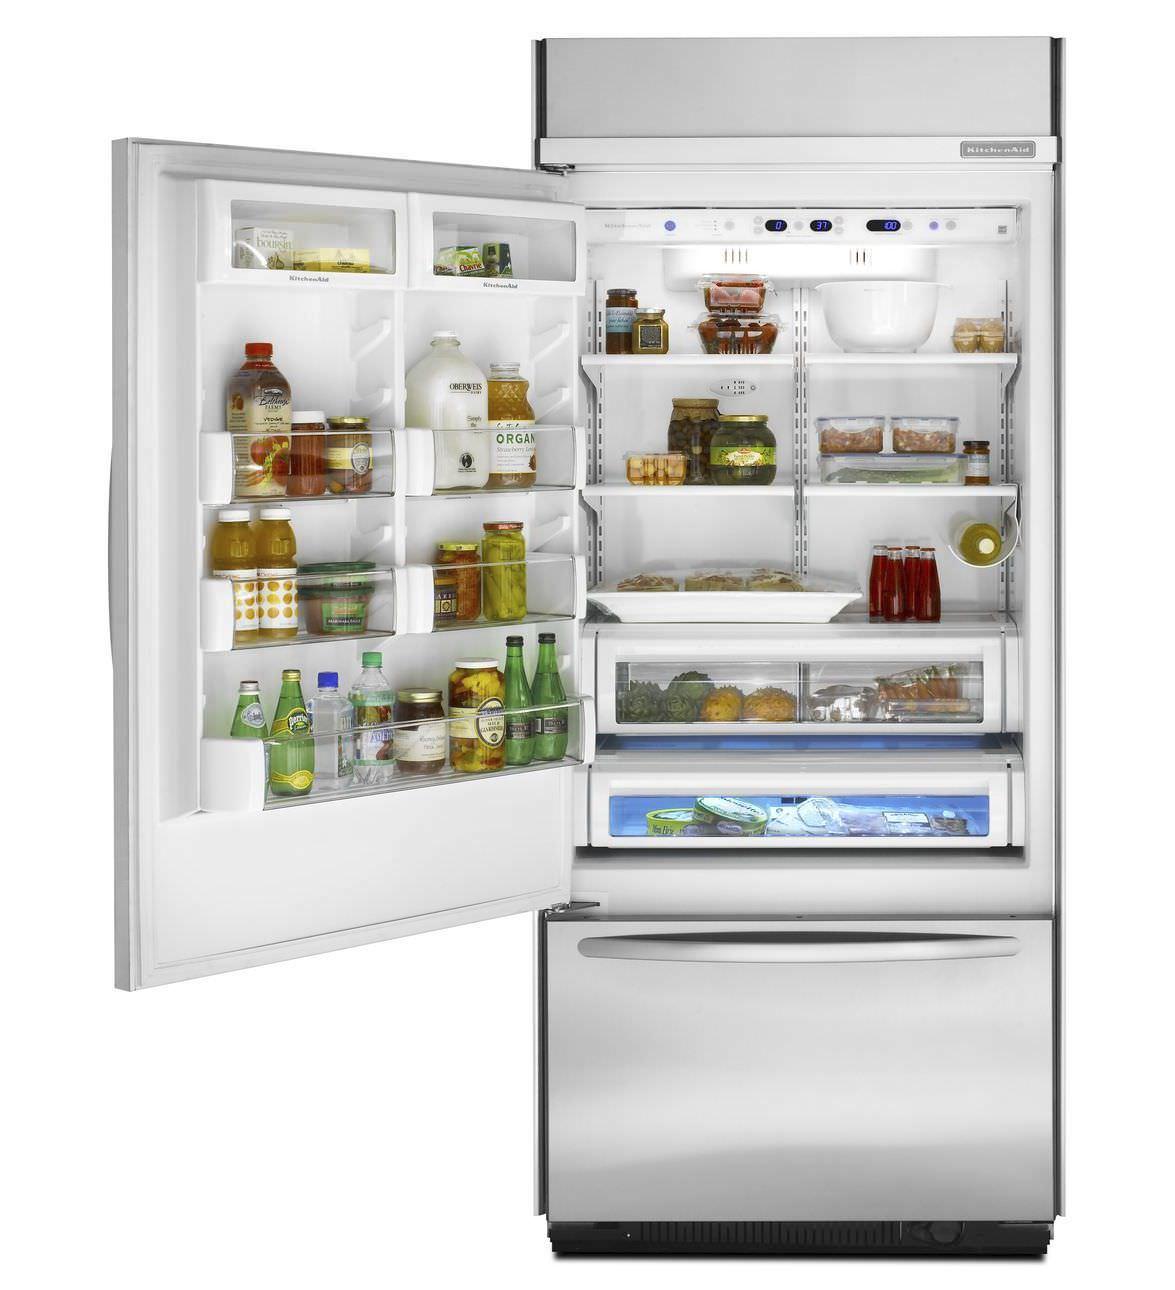 Energy Efficient Kitchen Appliances Residential Refrigerator Freezer Upright Stainless Steel